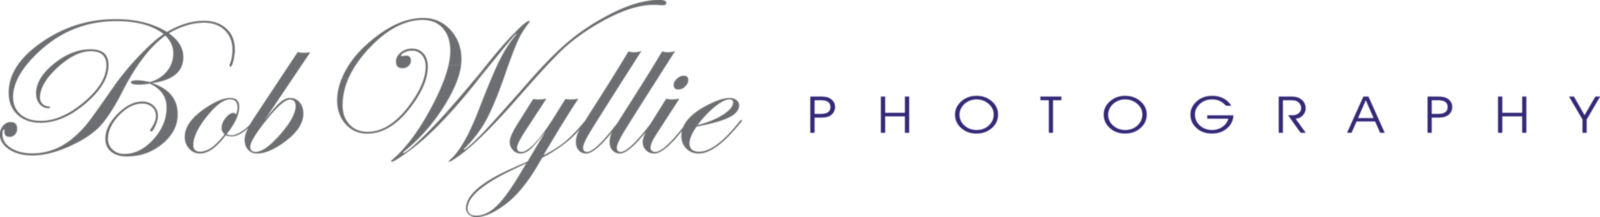 Bob Wyllie Photography Logo_2017_Gray-Purple